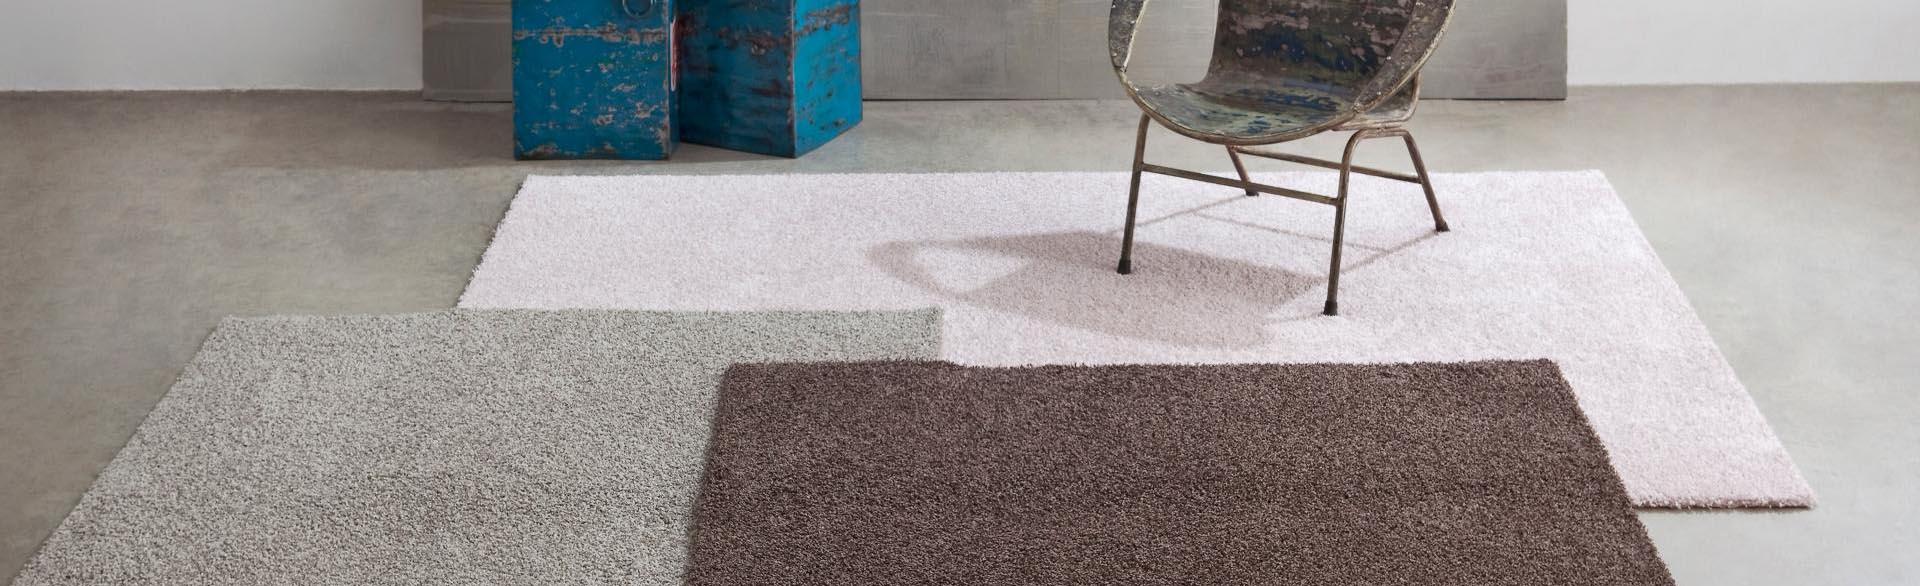 alfombras modernas fernndez textil - Alfombras Modernas